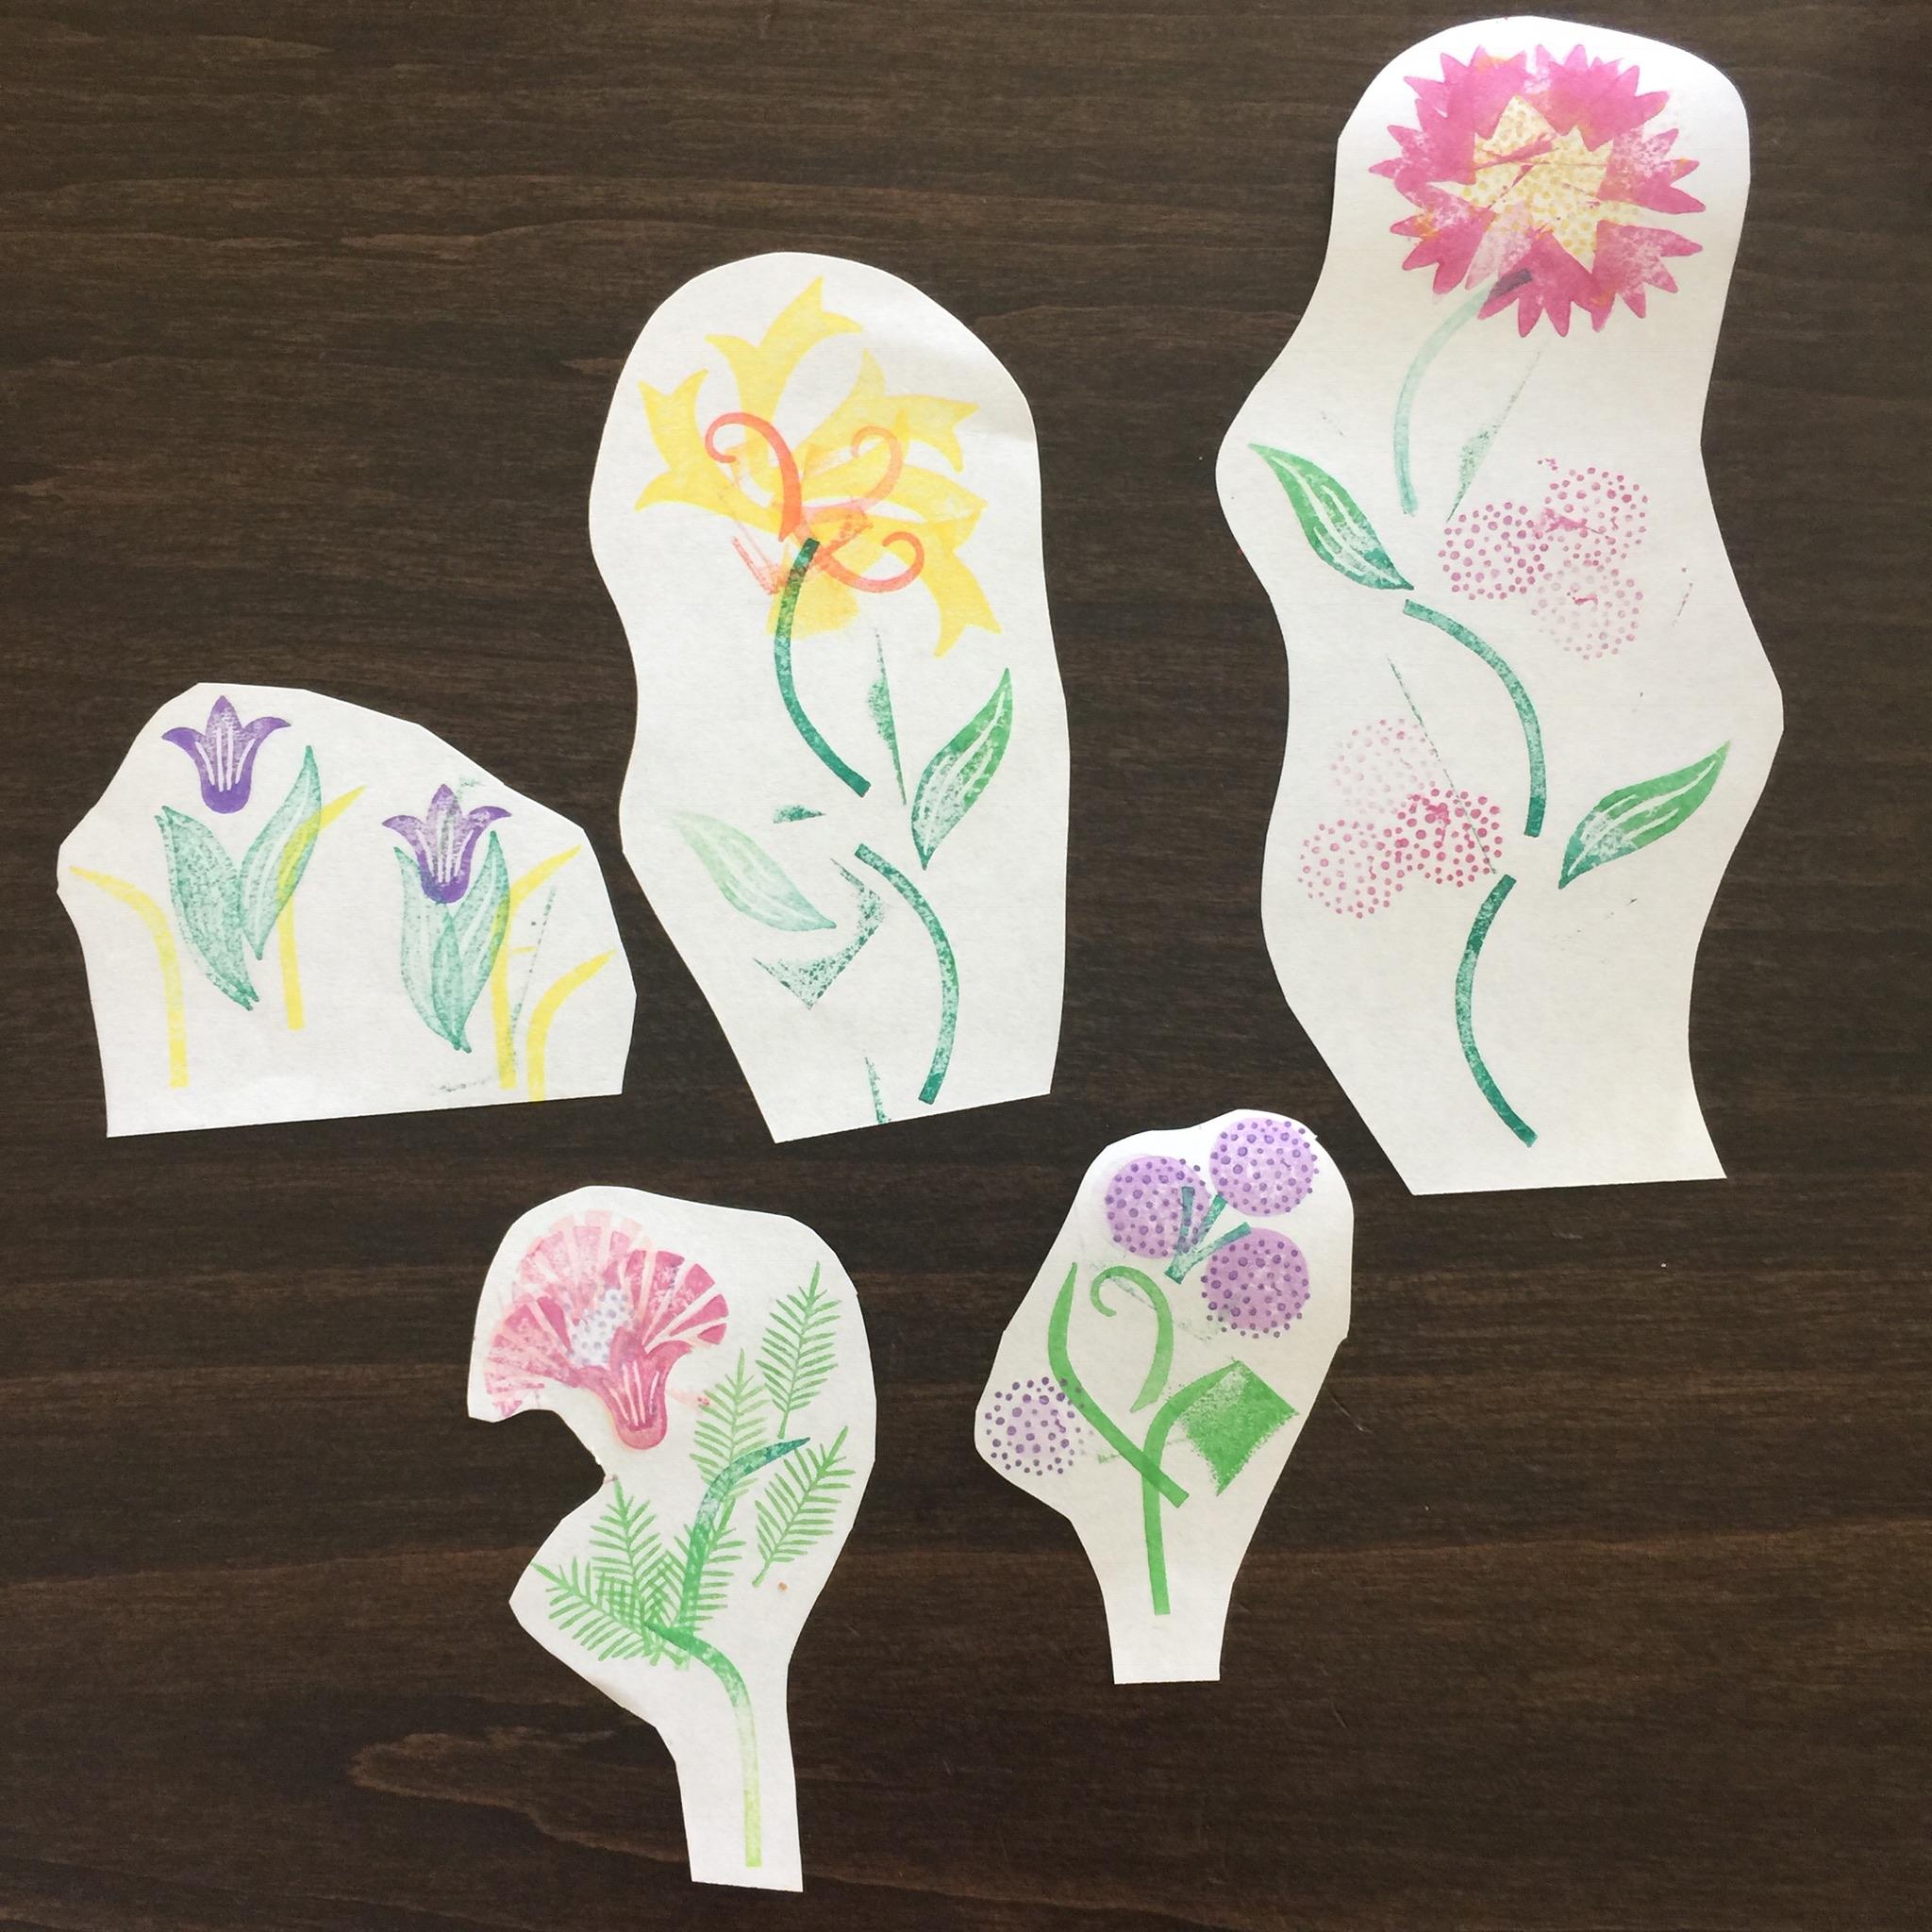 PAPress garden stamp art set gift mama artist family